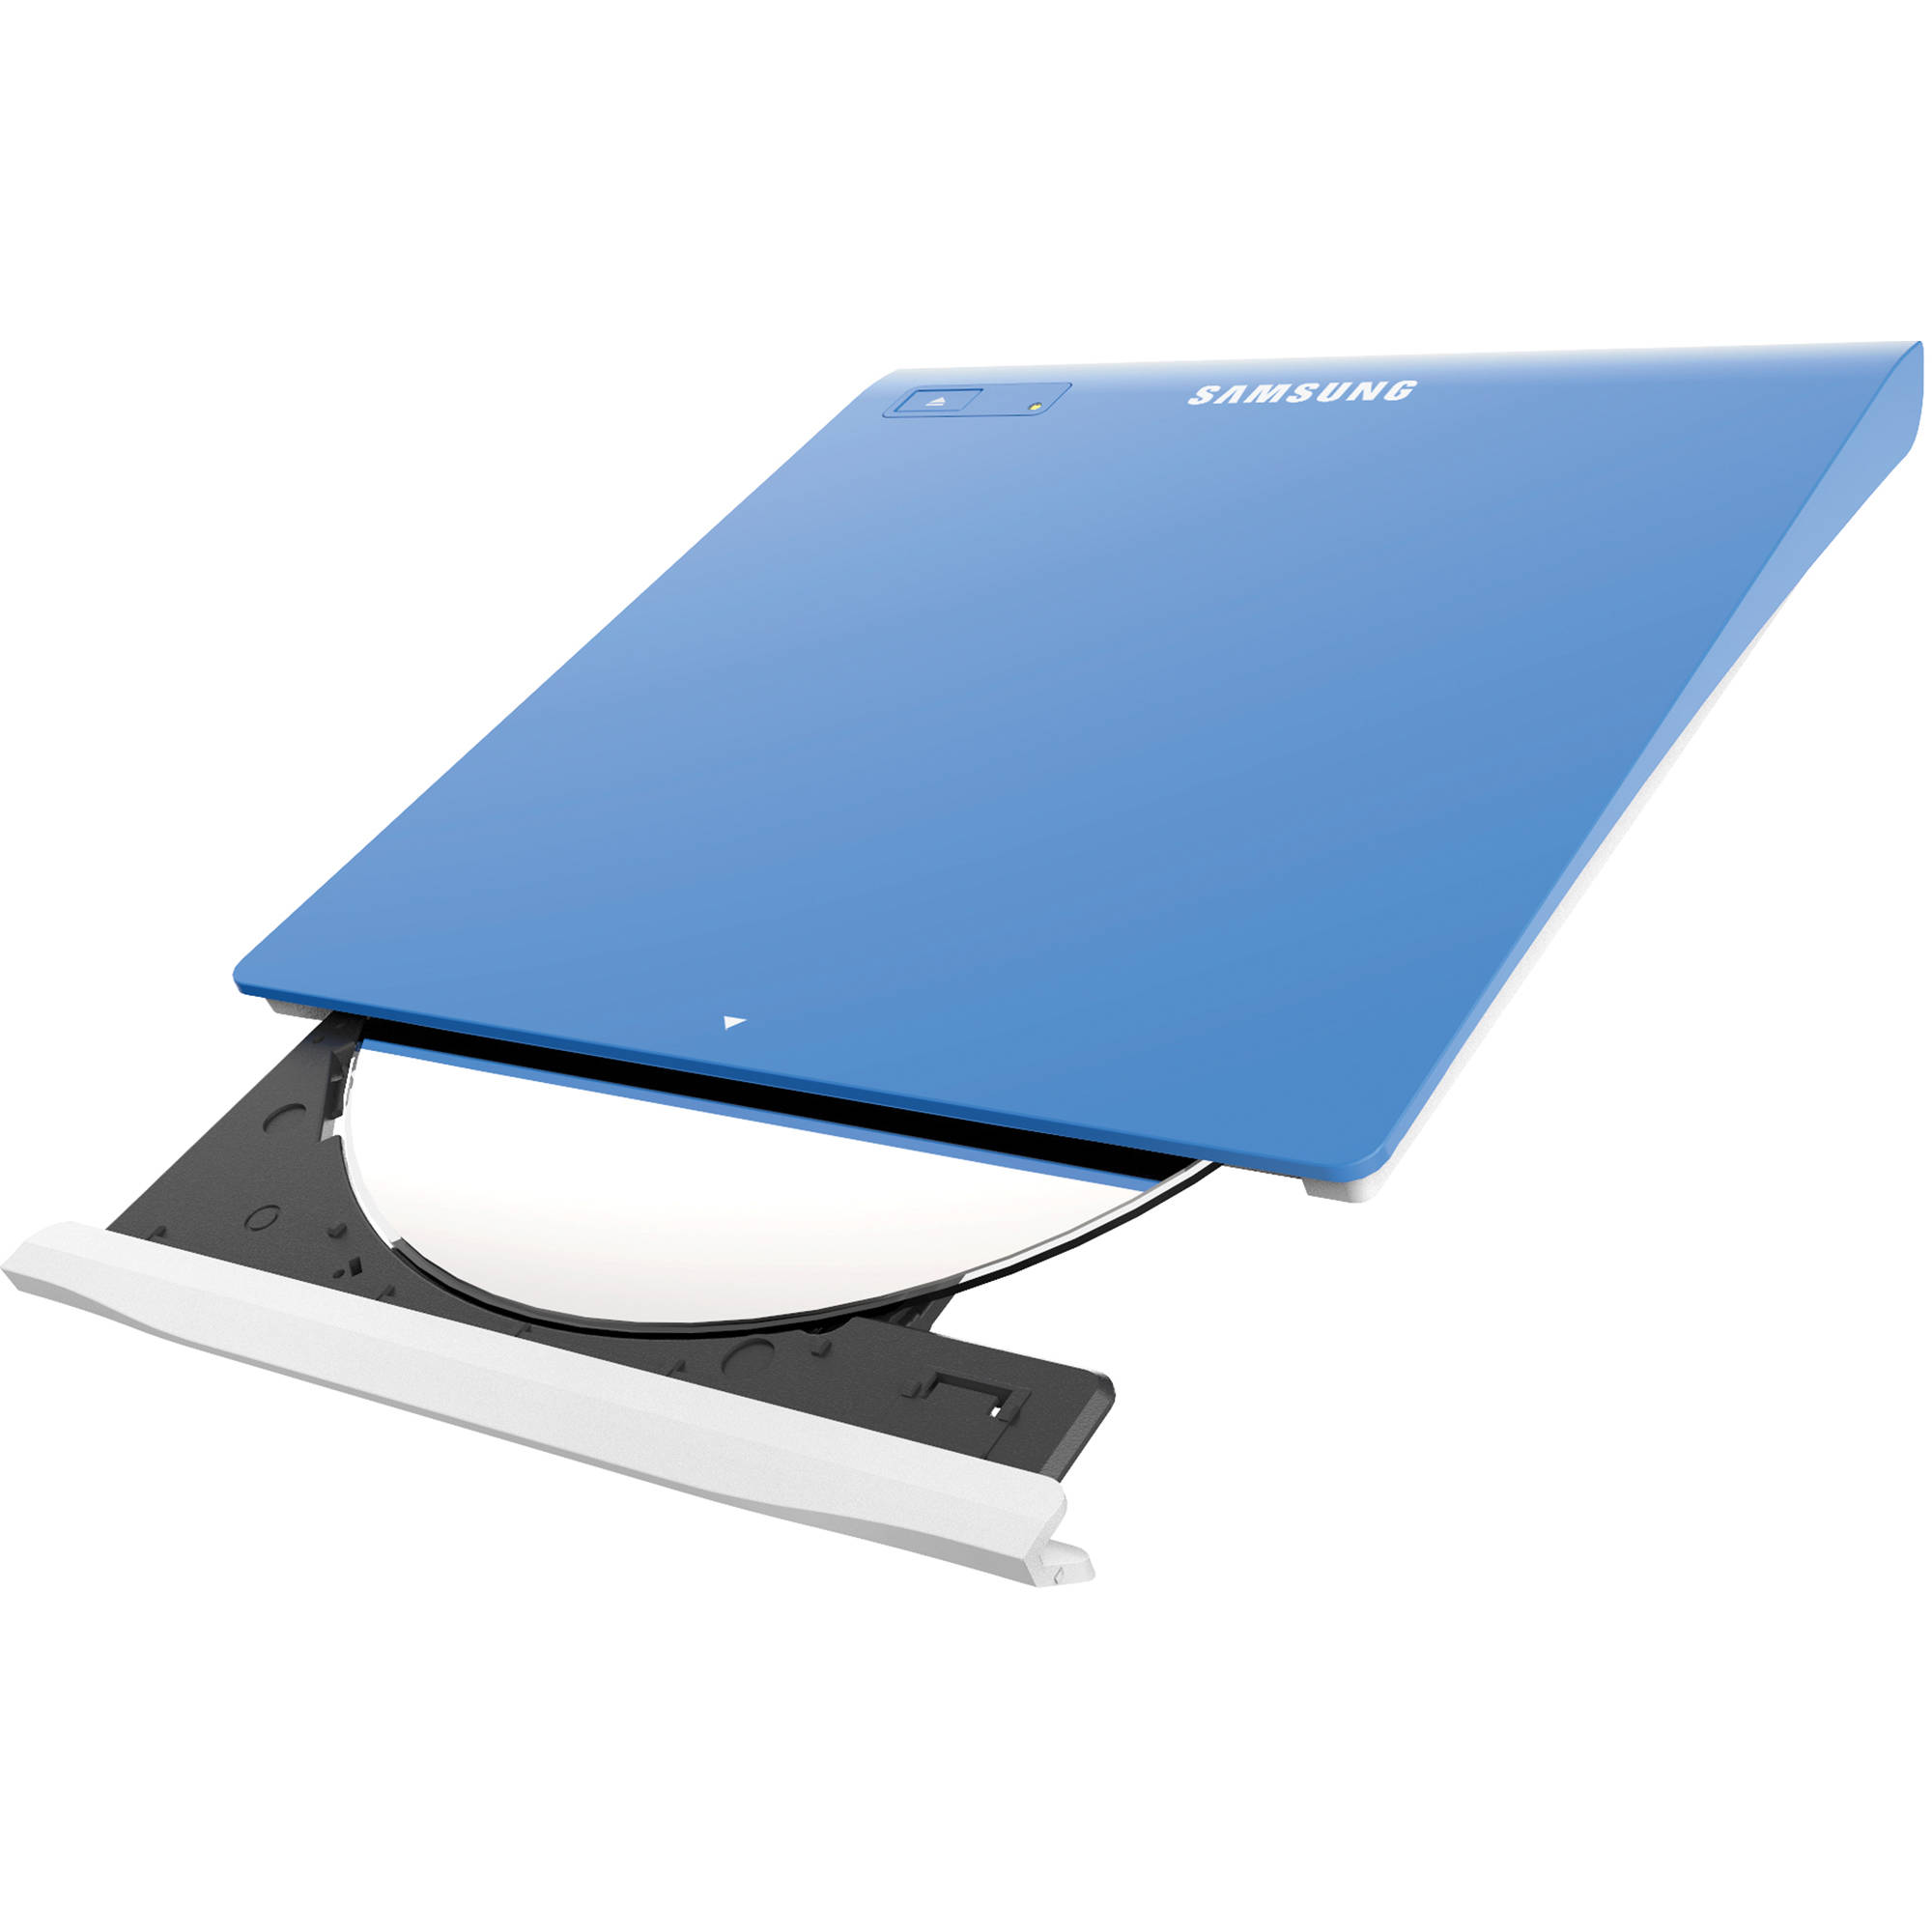 Samsung Portable Dvd Writer Se 208 Driver Windows 10